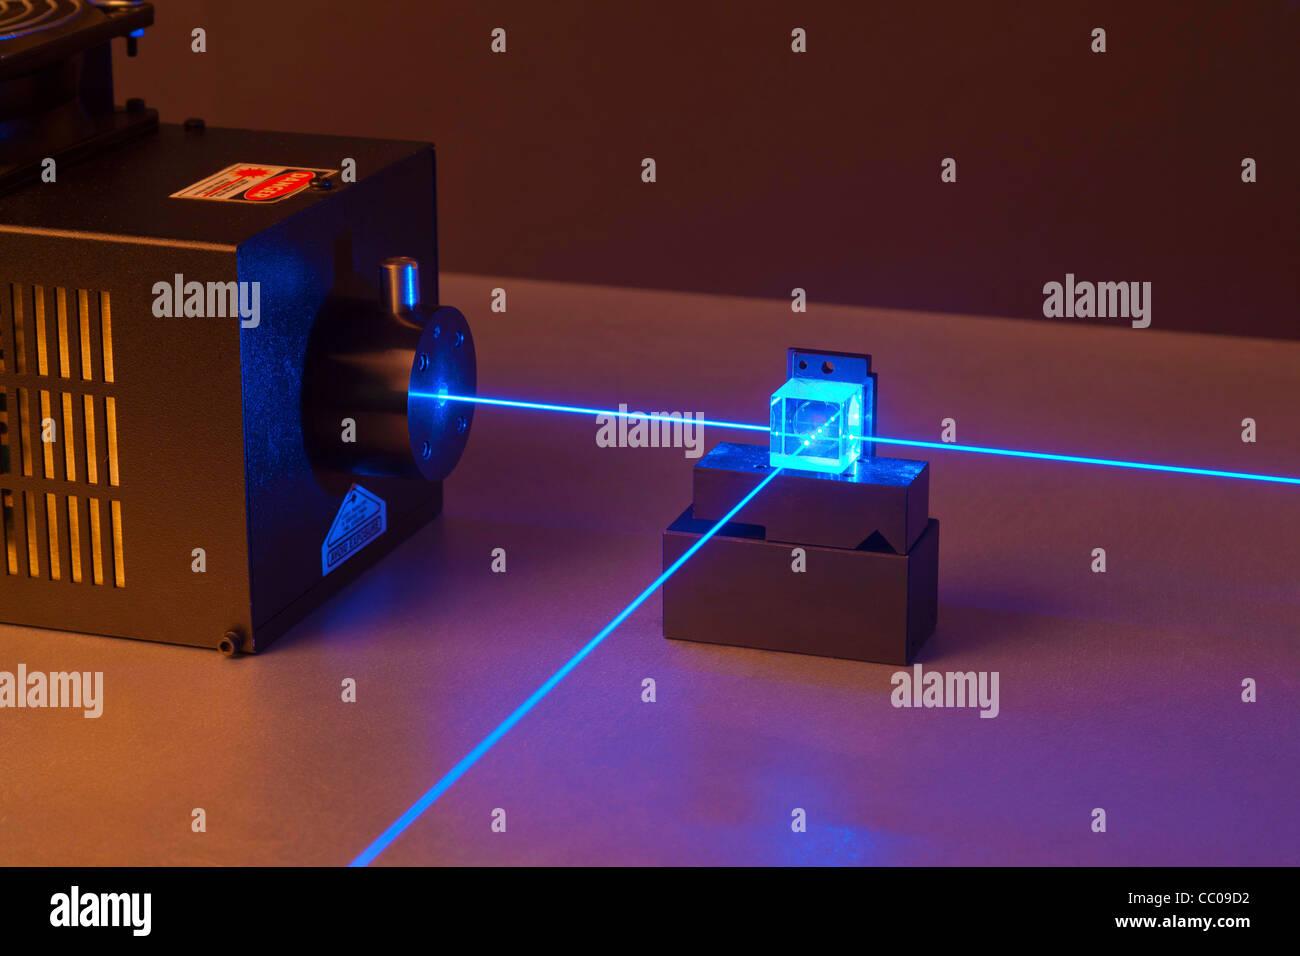 argon ion laser beam passing through a beam splitter - Stock Image